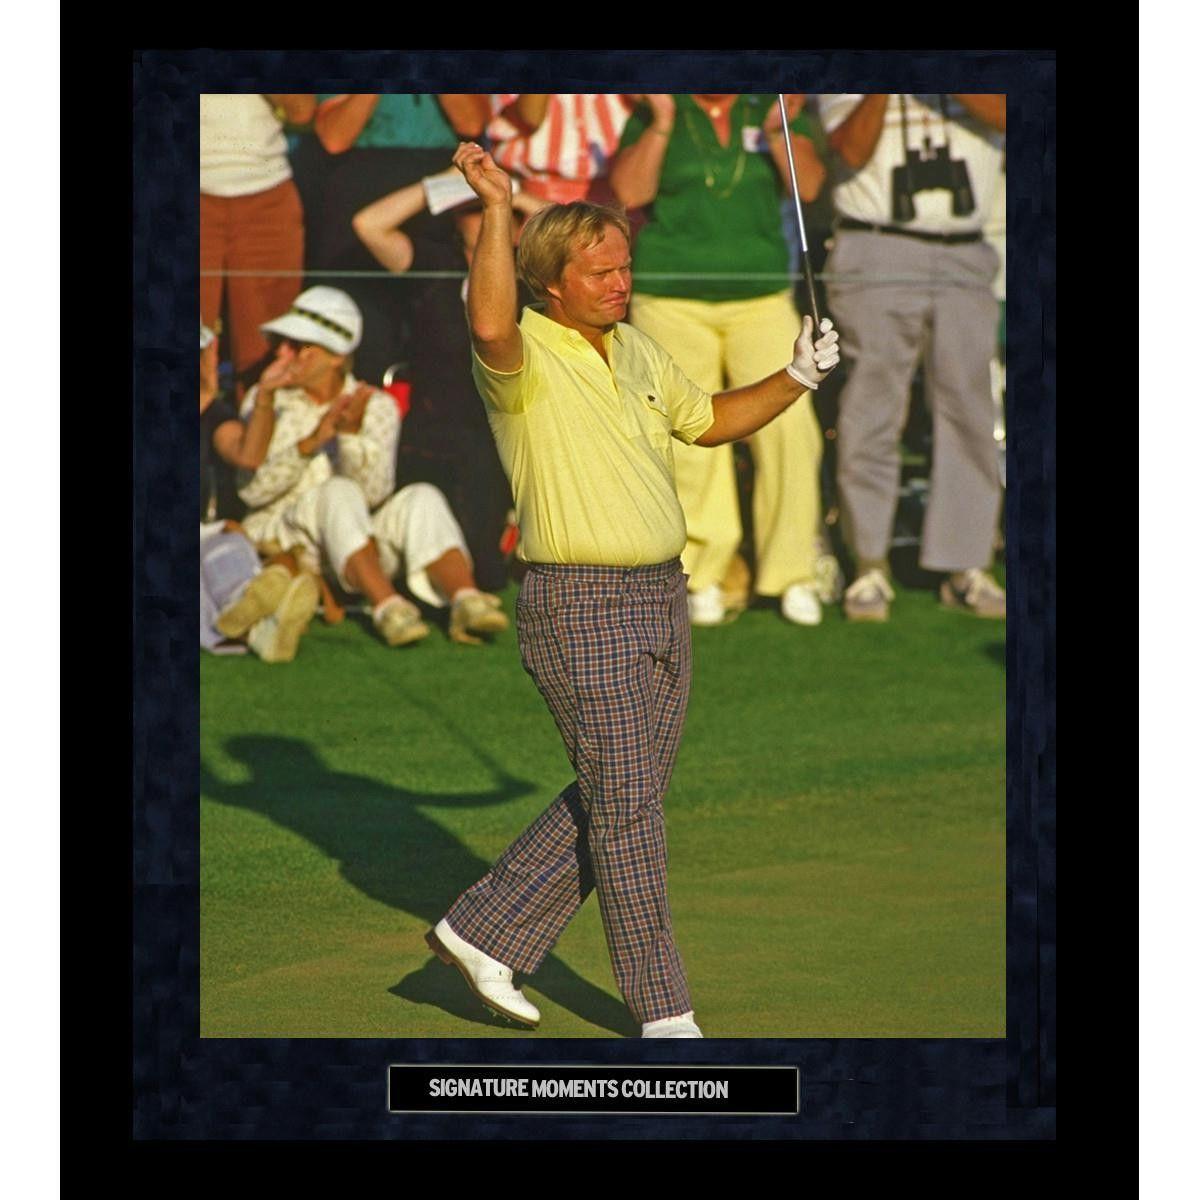 Jack Nicklaus 1986 Masters Wave Framed Golden Moments 16x20 Photo